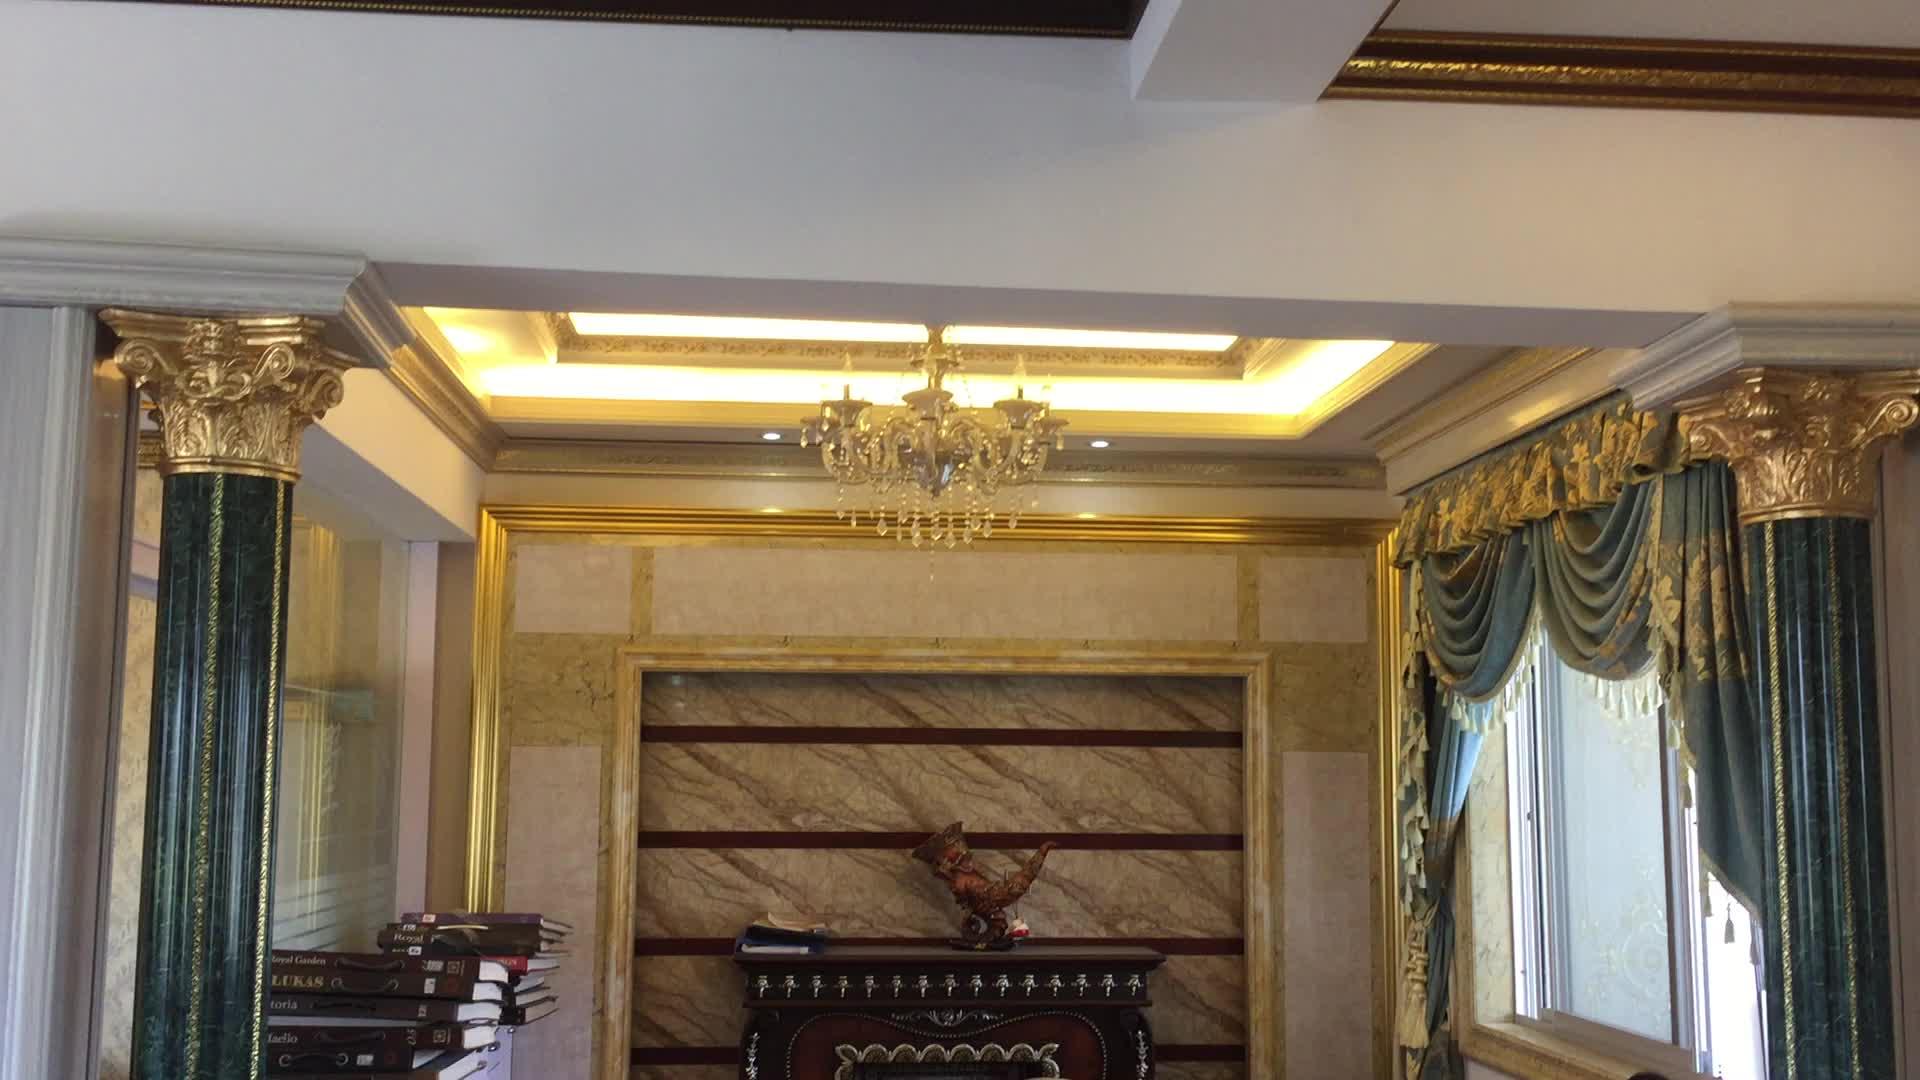 Fiberglass Wedding Columns For Wedding Decorating - Buy Columns,Fiberglass  Wedding Columns,Fiberglass Columns For Wedding Decorating Product on ...